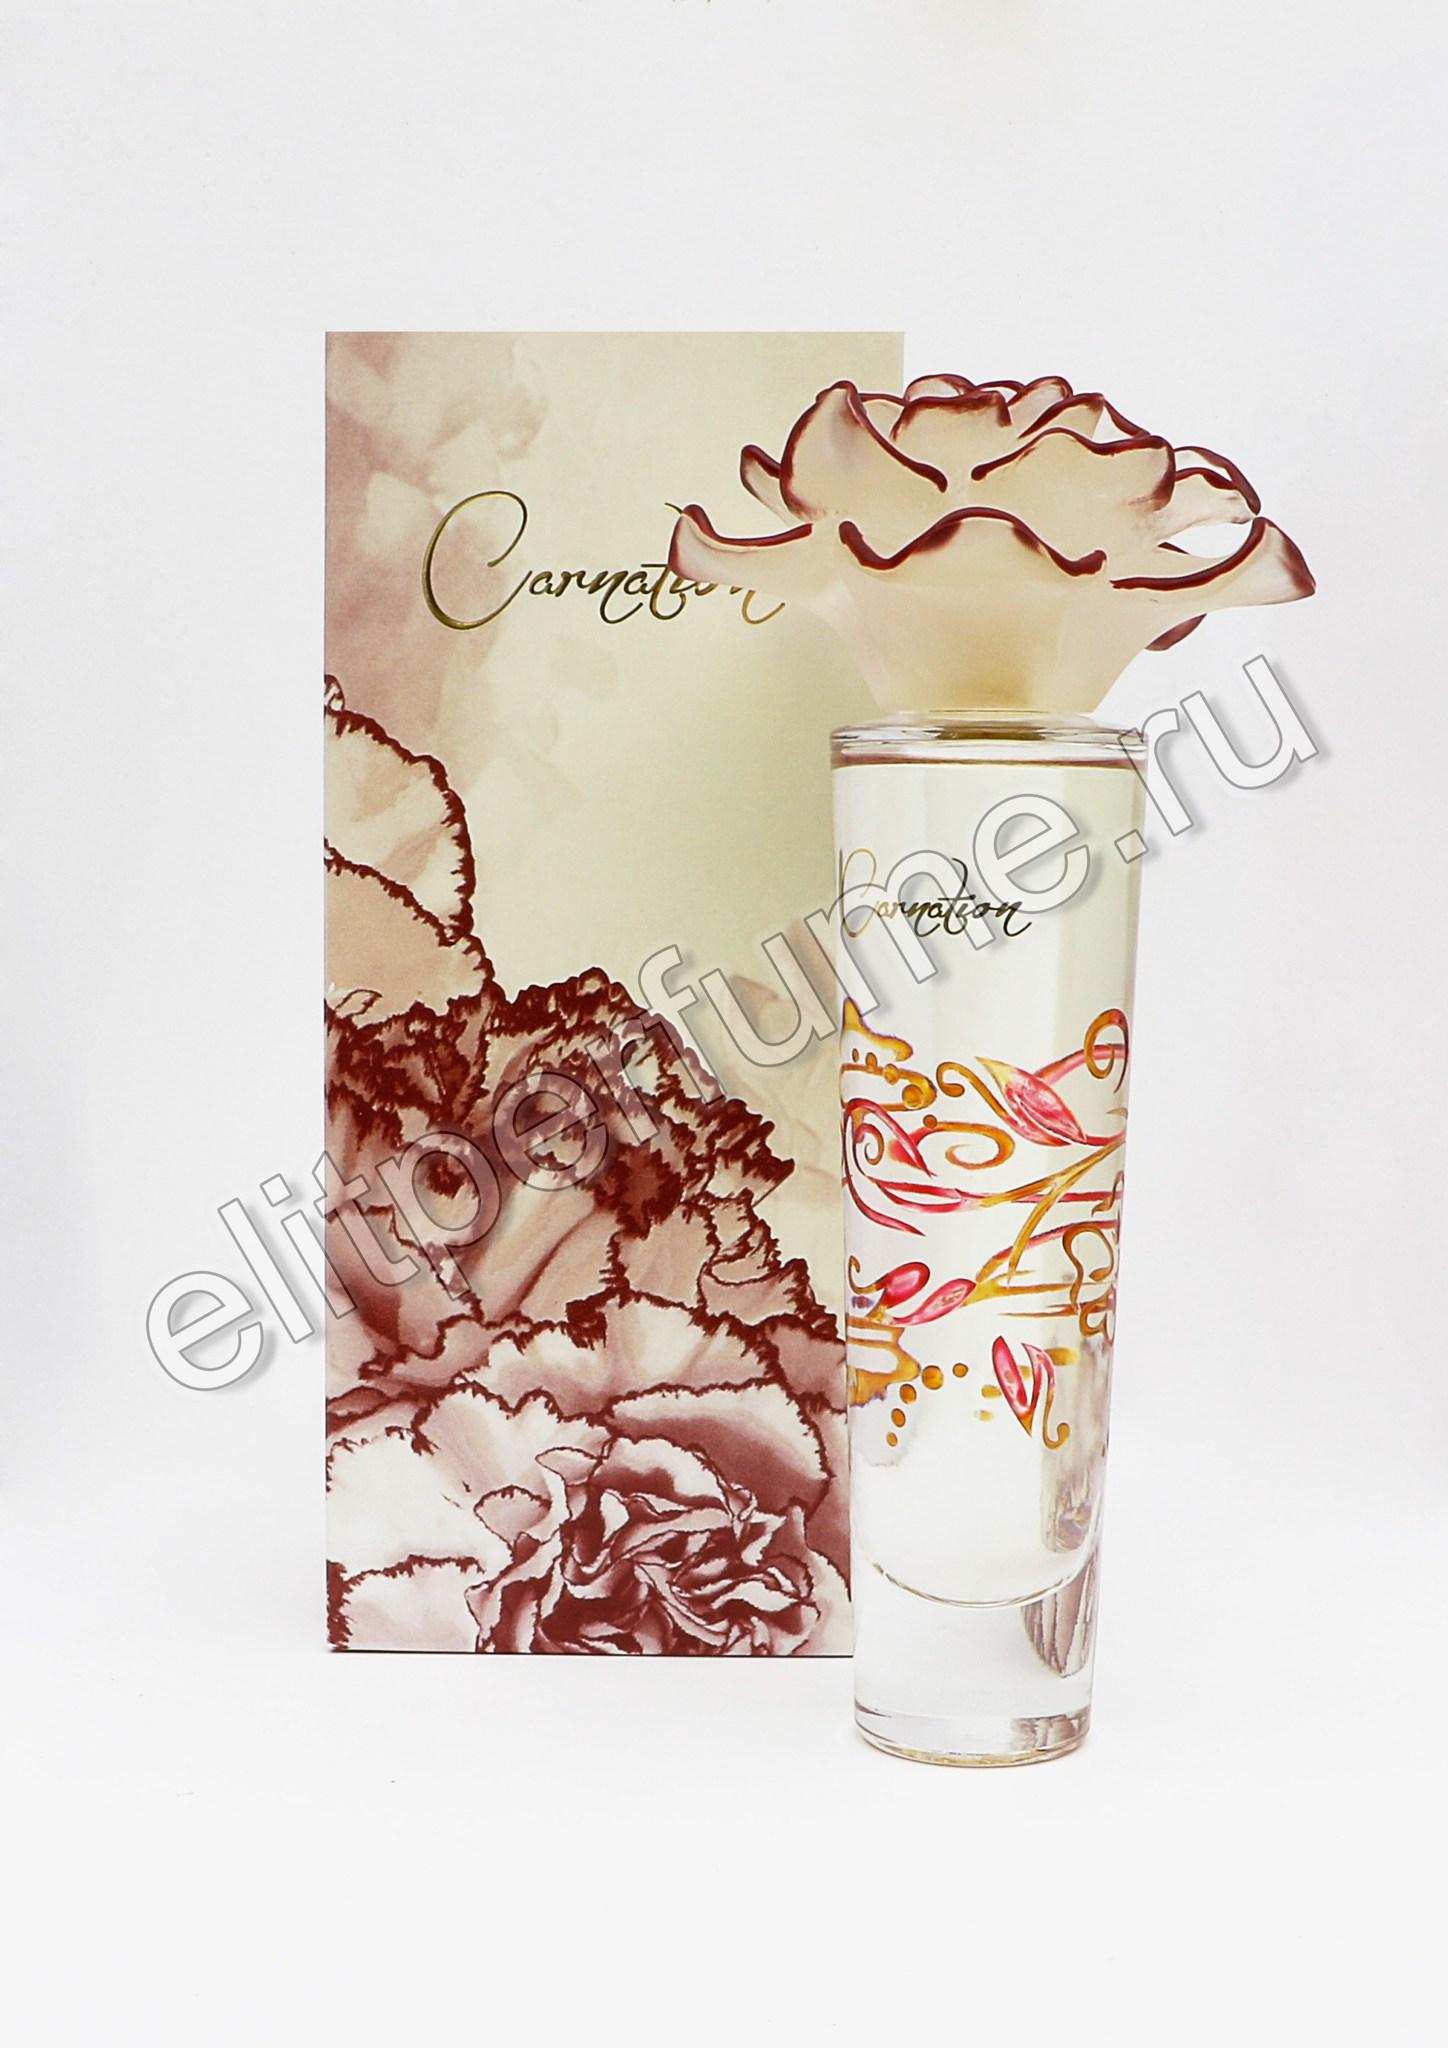 Carnation  Гвоздика 100 мл спрей от Саид Джунаид Алам Syed Junaid Alam